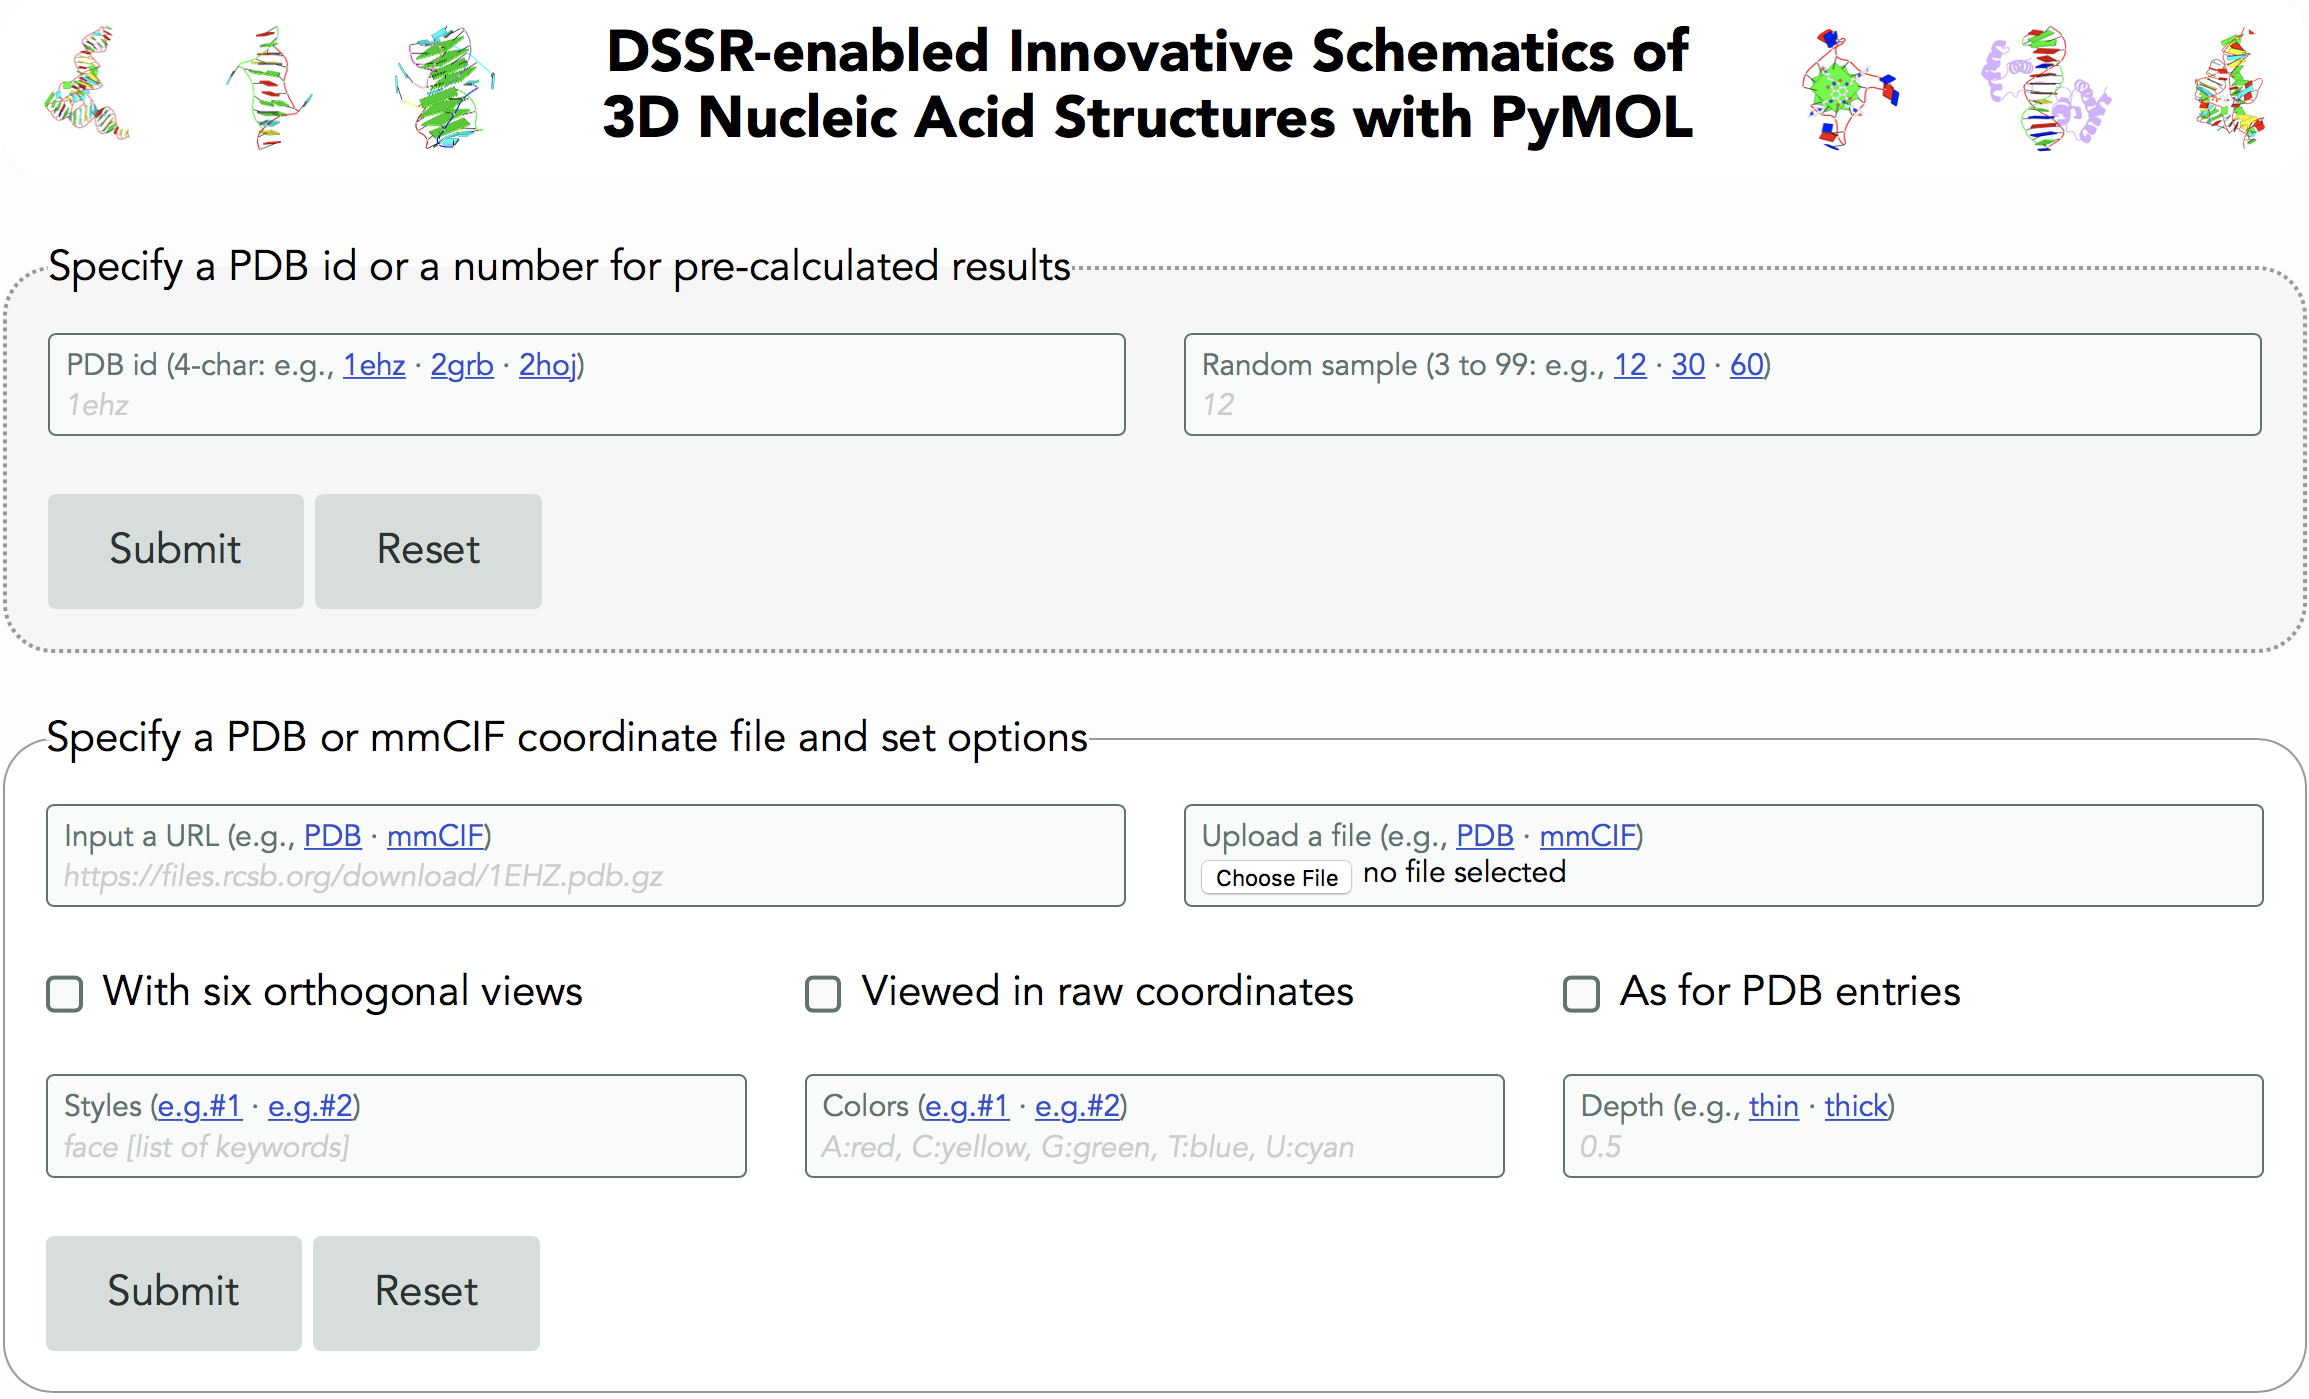 Screenshot of the homepage of DSSR/PyMOL schematics